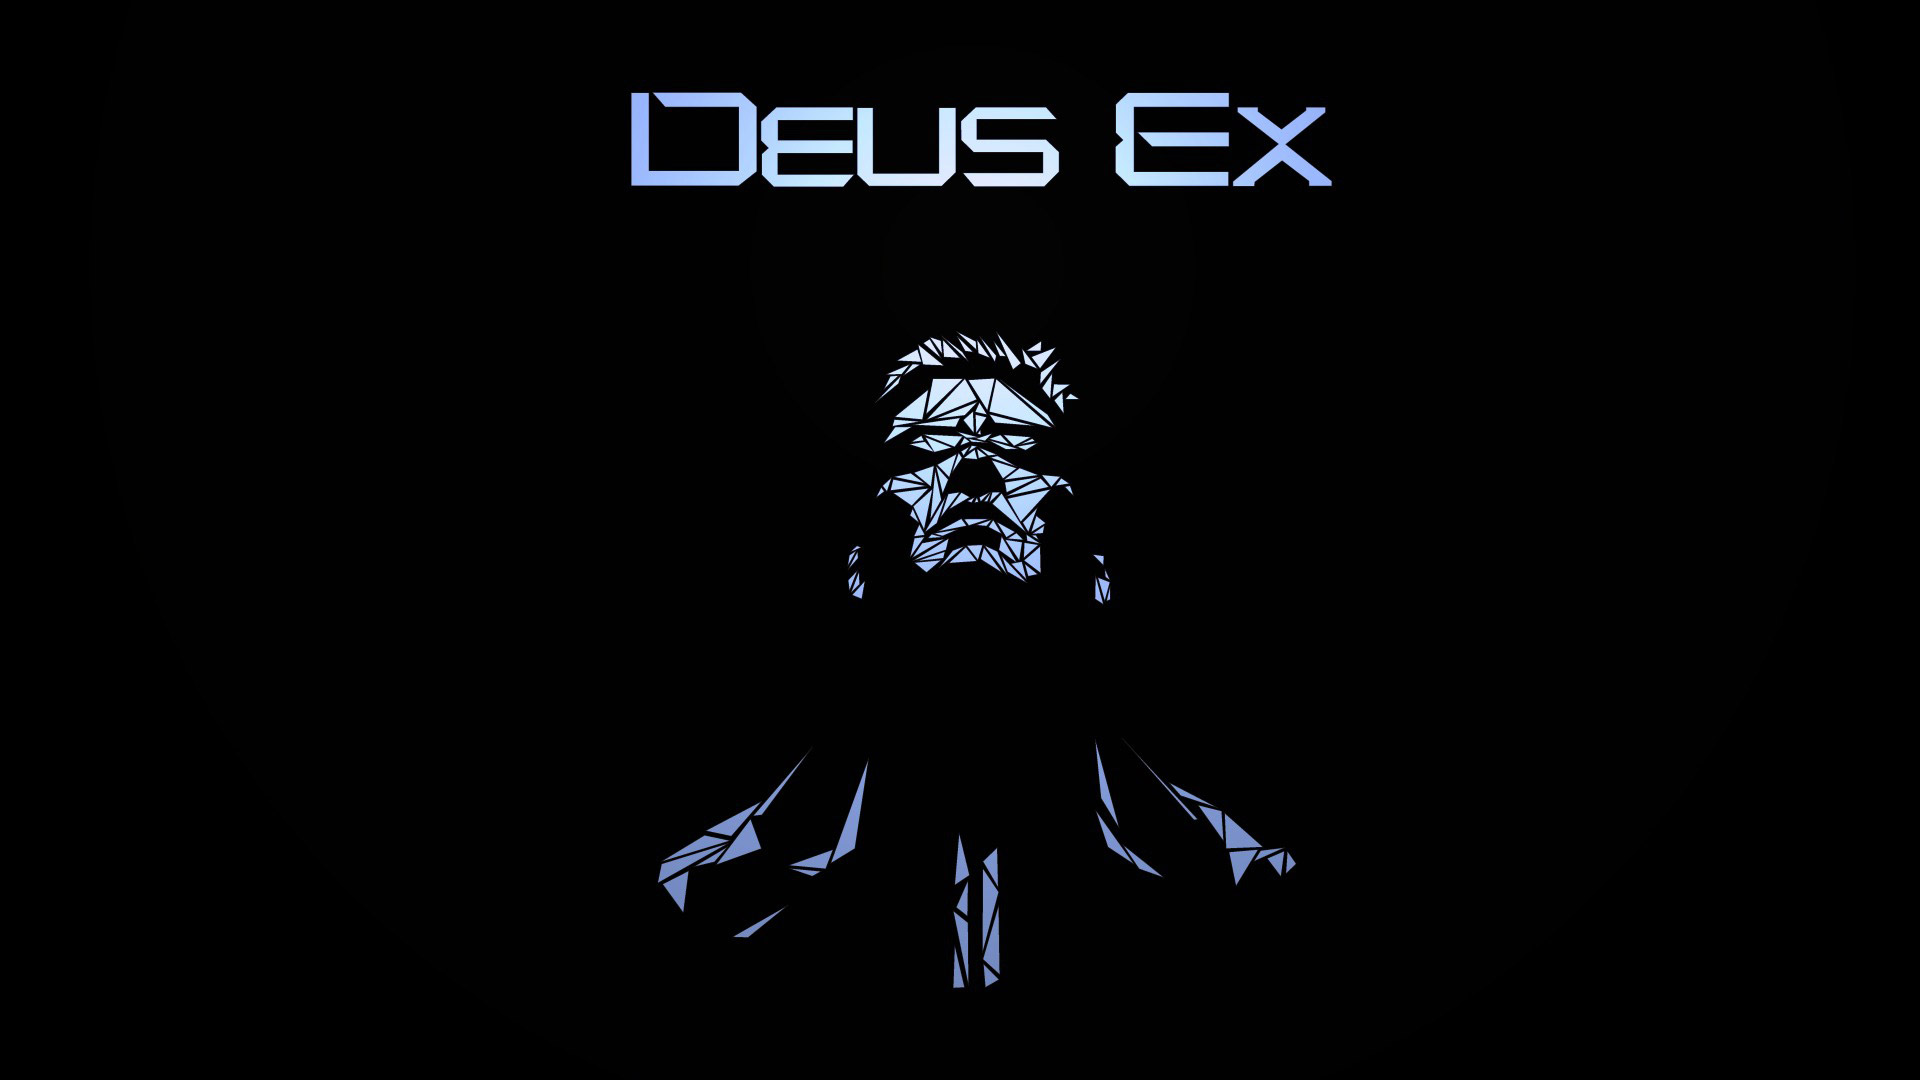 Free Deus Ex Wallpaper in 1920x1080